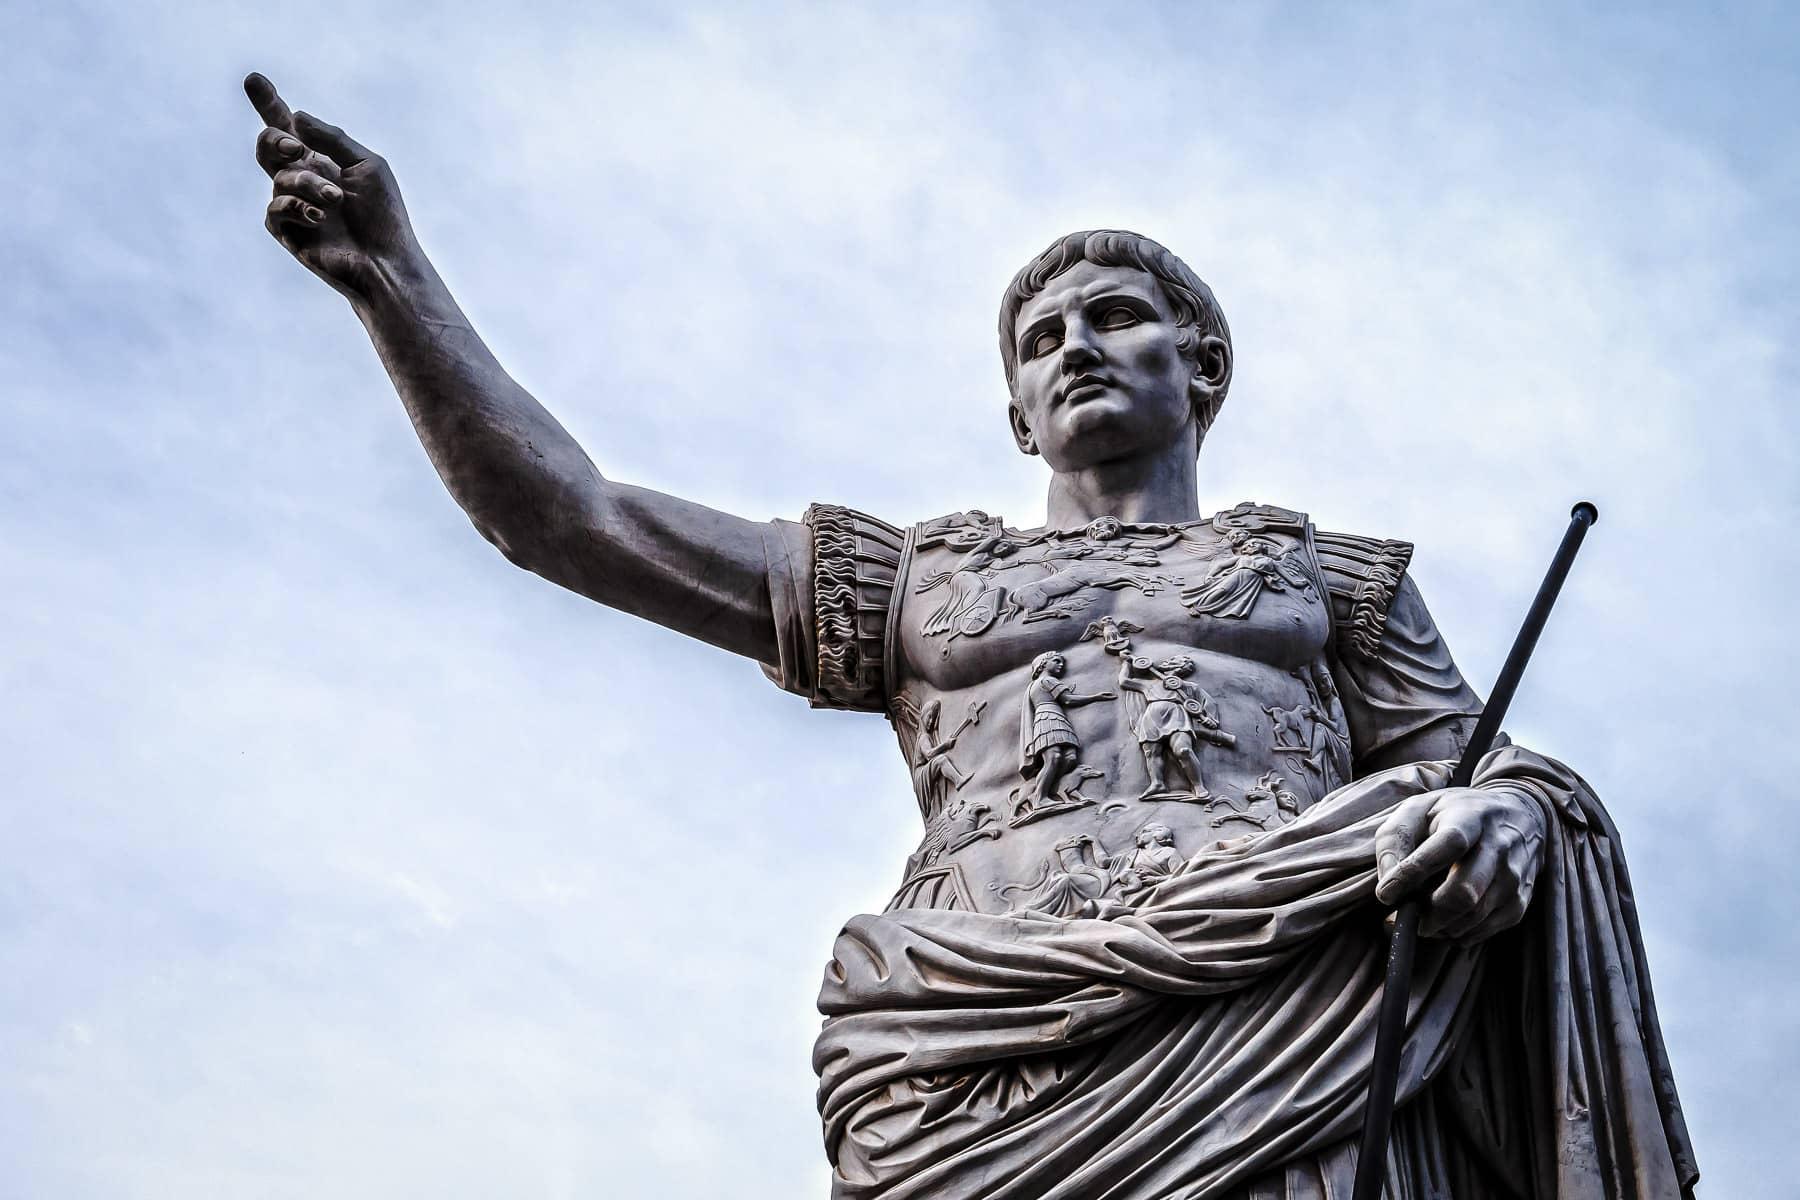 A statue of Julius Caesar at Caesars Palace, Las Vegas.